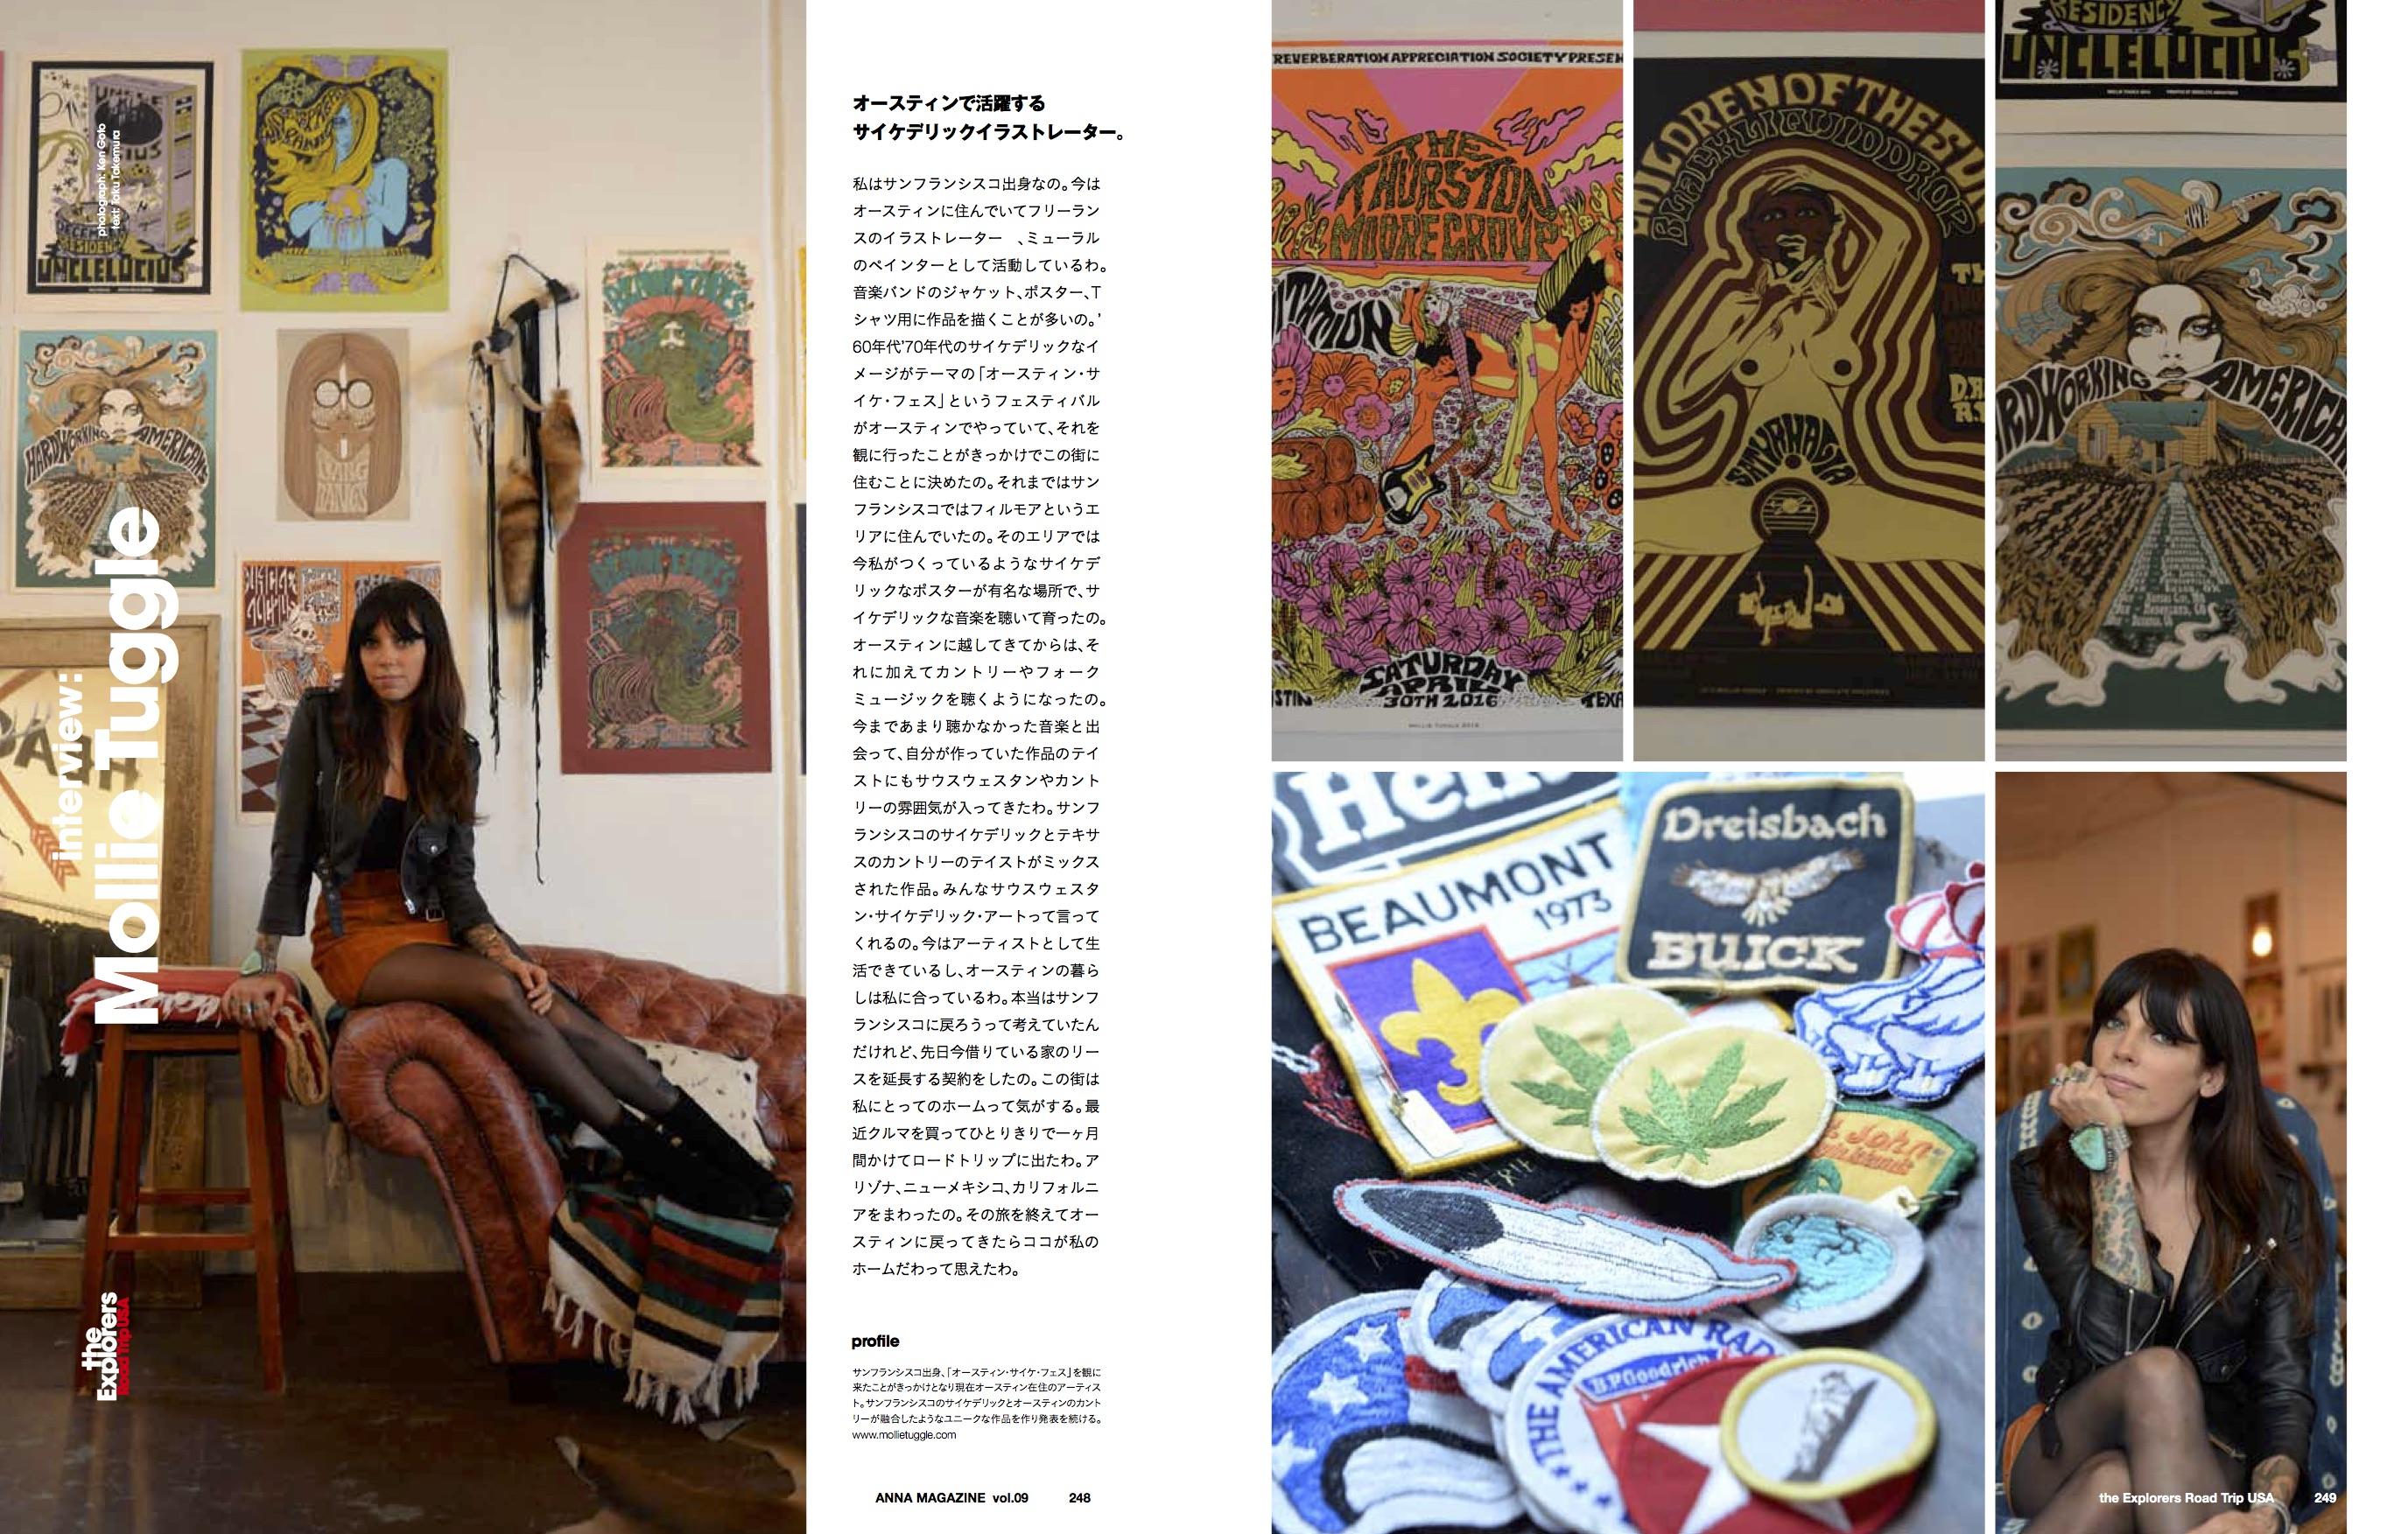 anna magazine vol.9 P117